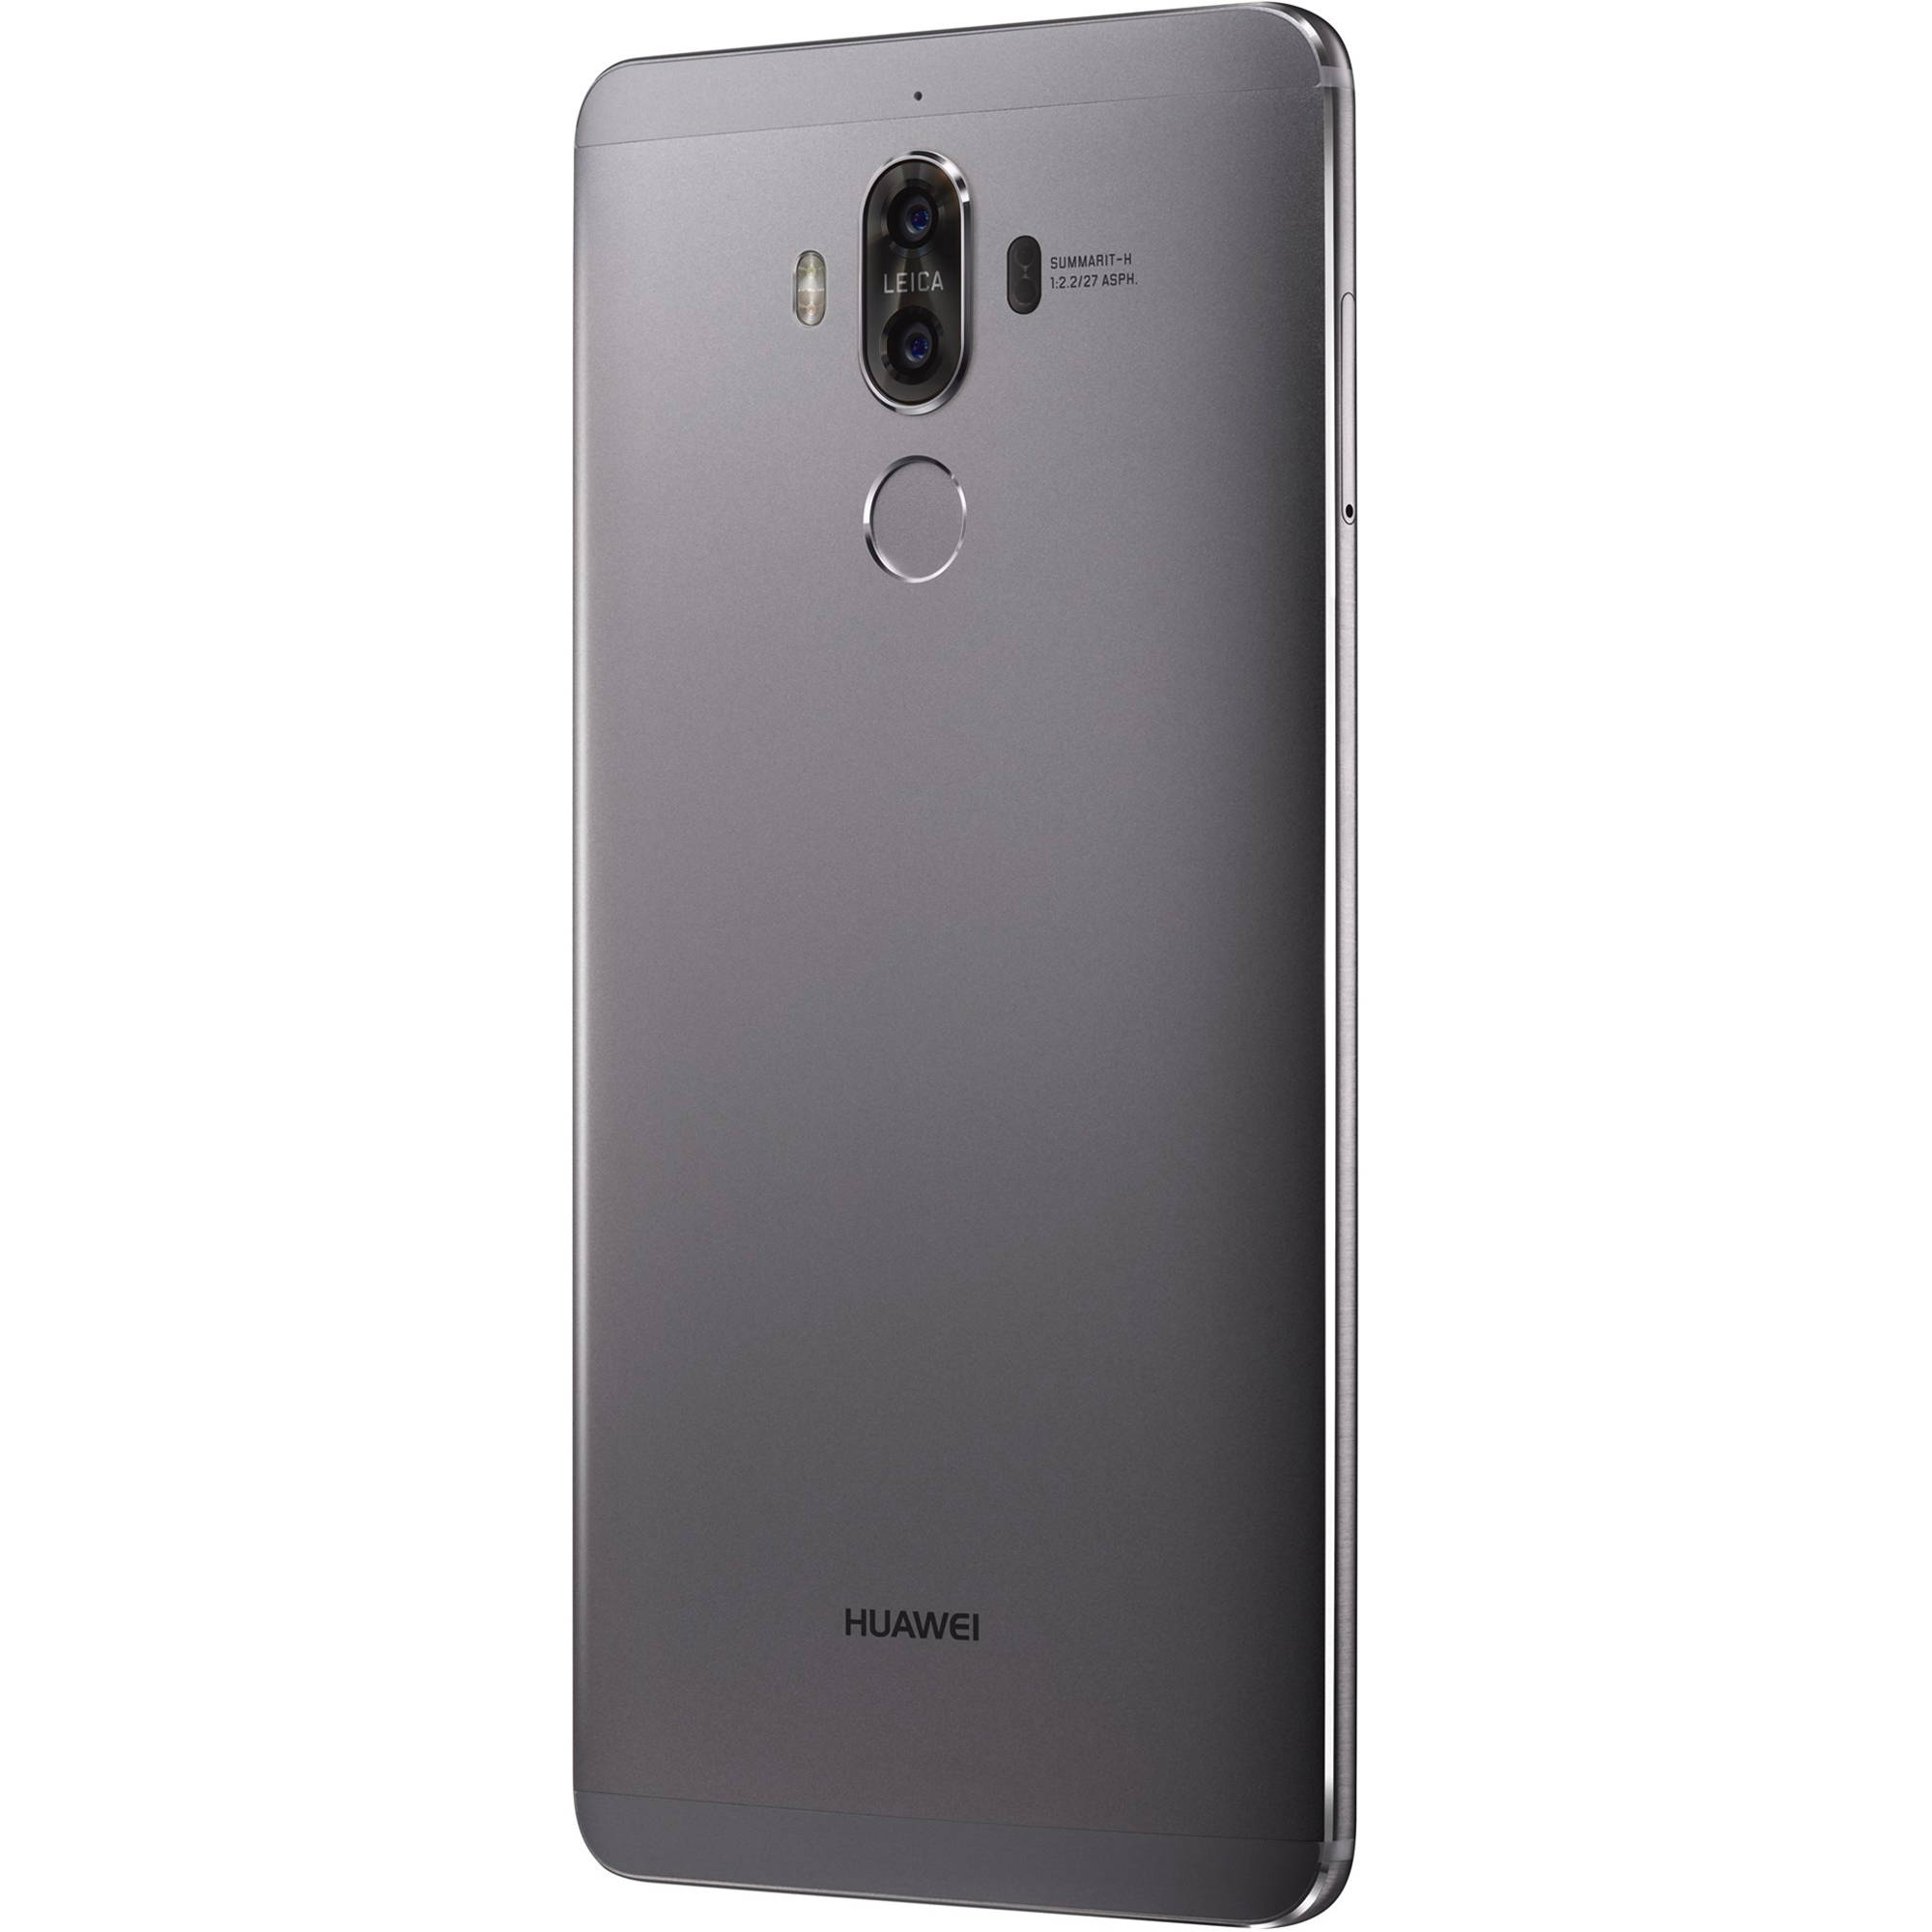 Huawei Mate 9 MHA-L29 64GB Smartphone (Unlocked, Space Gray)